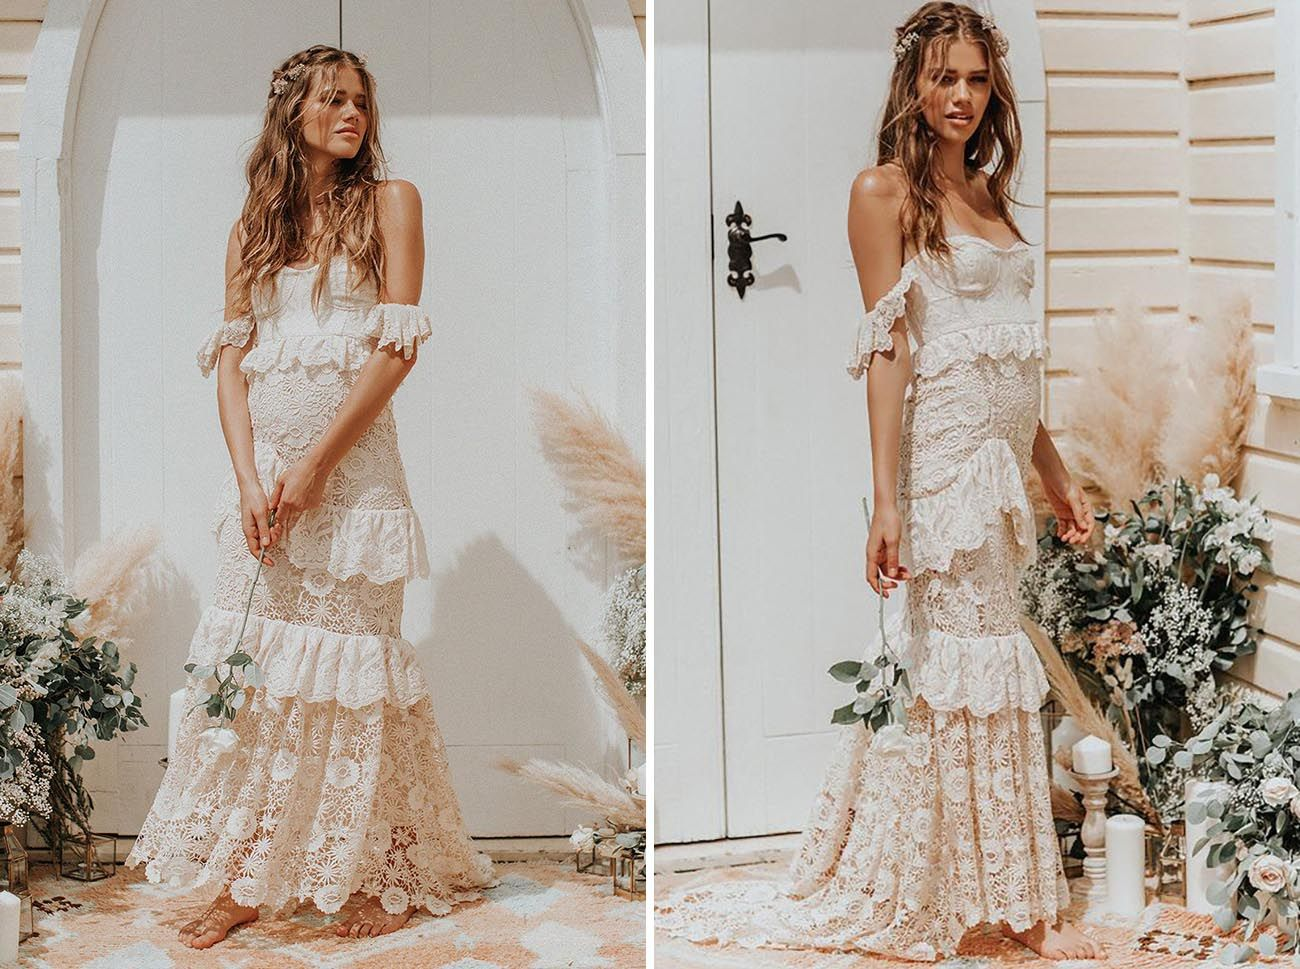 Surf sand wedding dresses for your laidback beach wedding